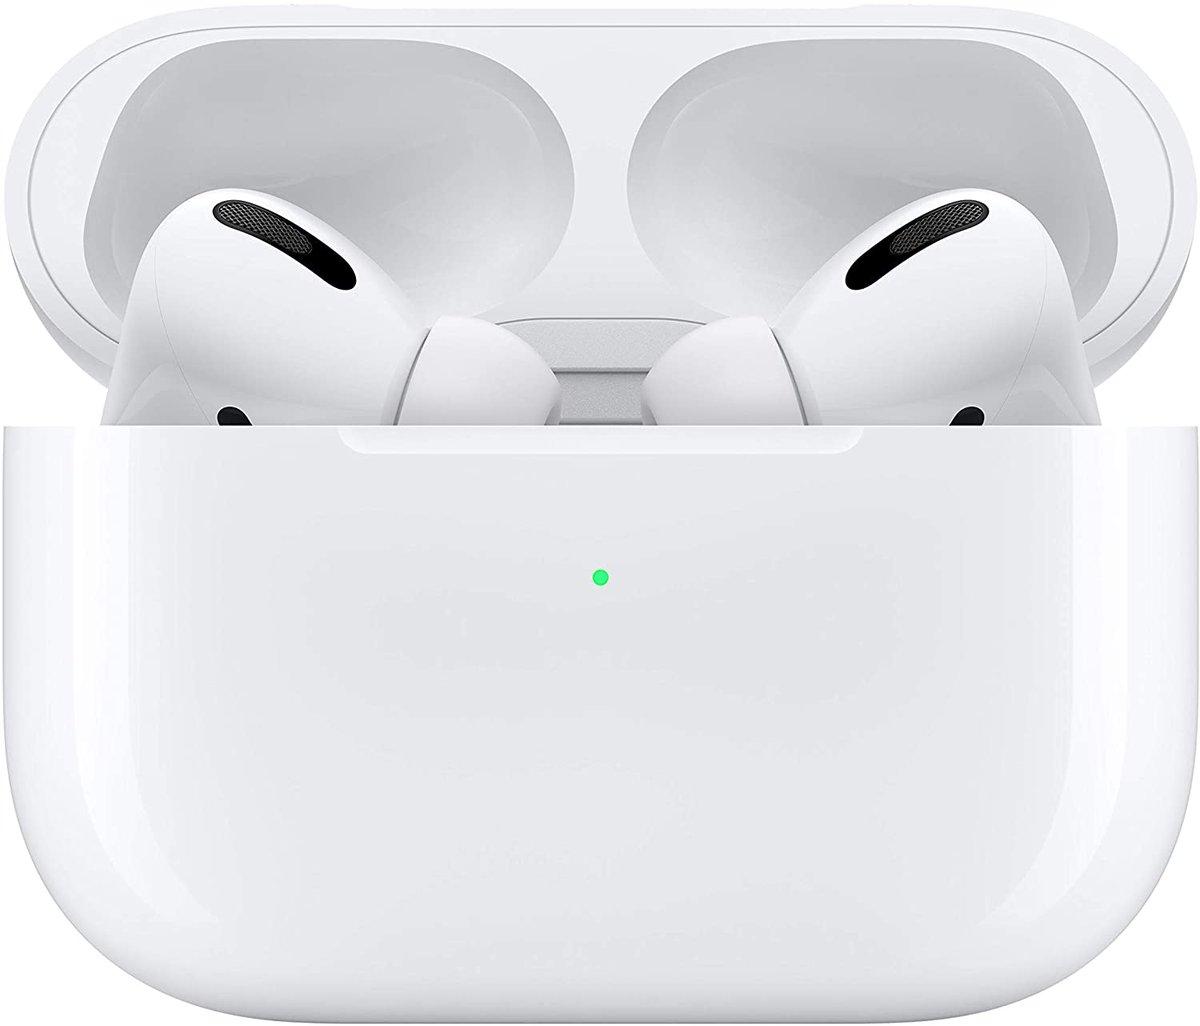 Para los que viven en USA: Apple AirPods Pro se ponen de 249 a 197 dólares 2